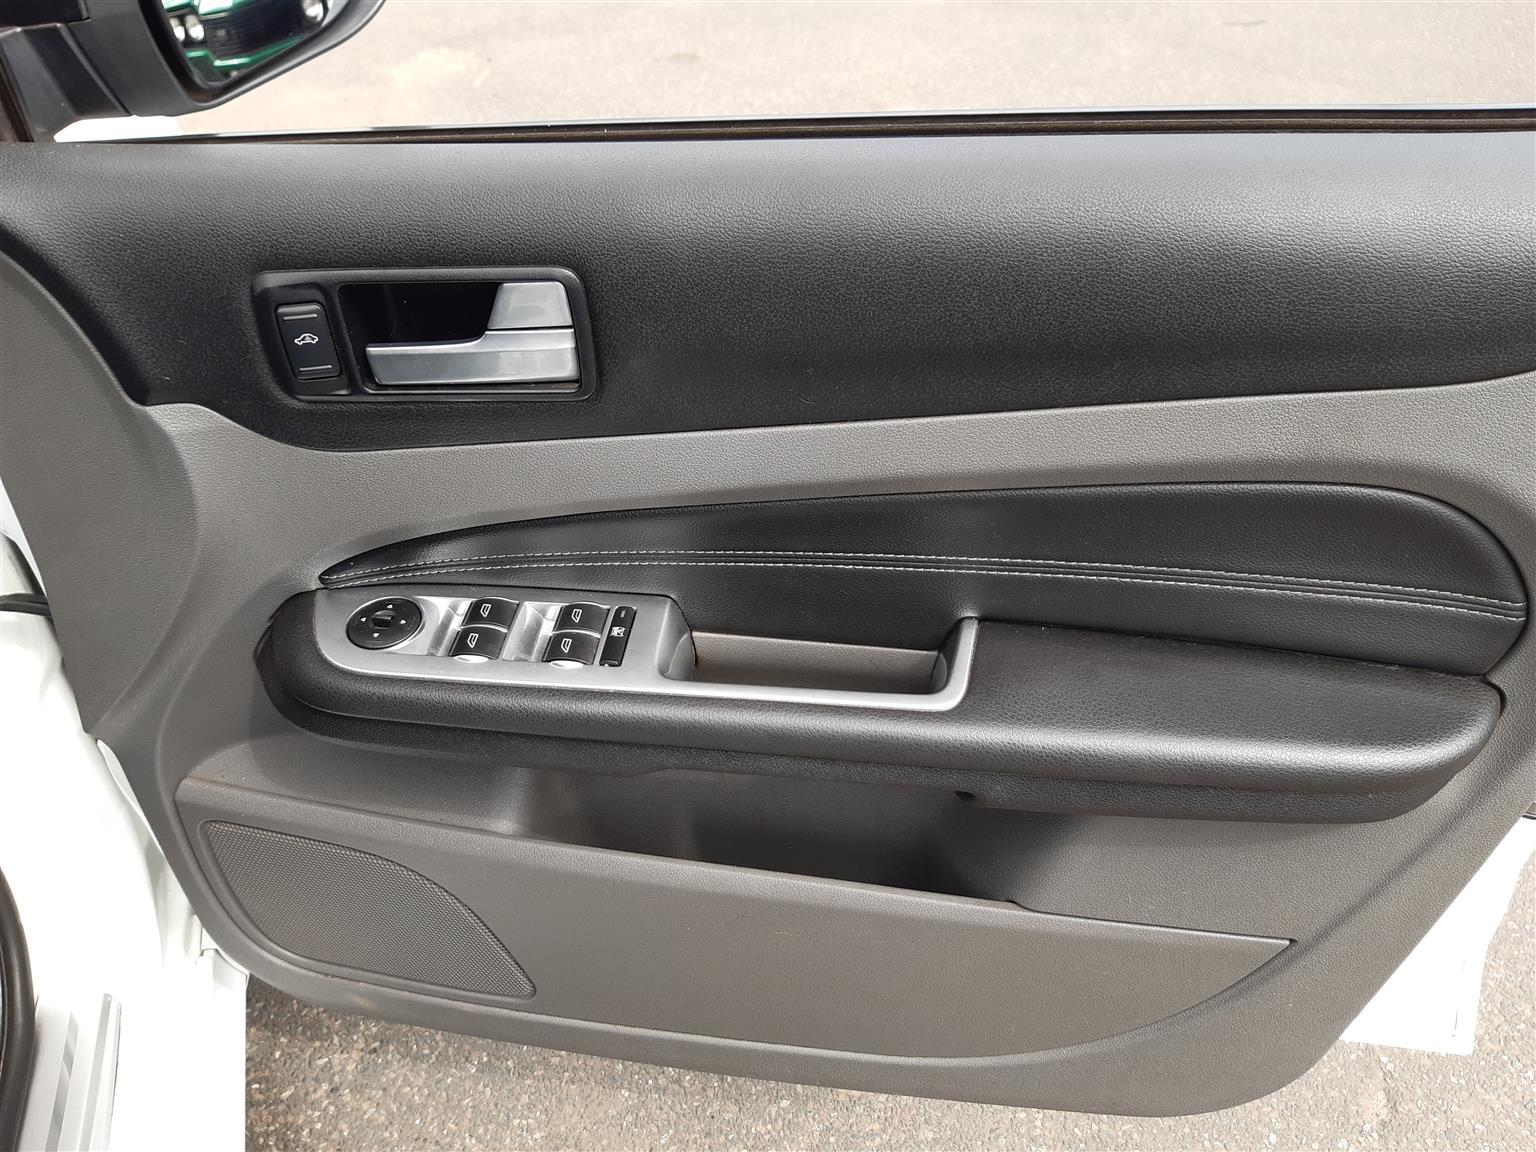 2010 Ford Focus hatch 3-door FOCUS 2.5 ST 3Dr